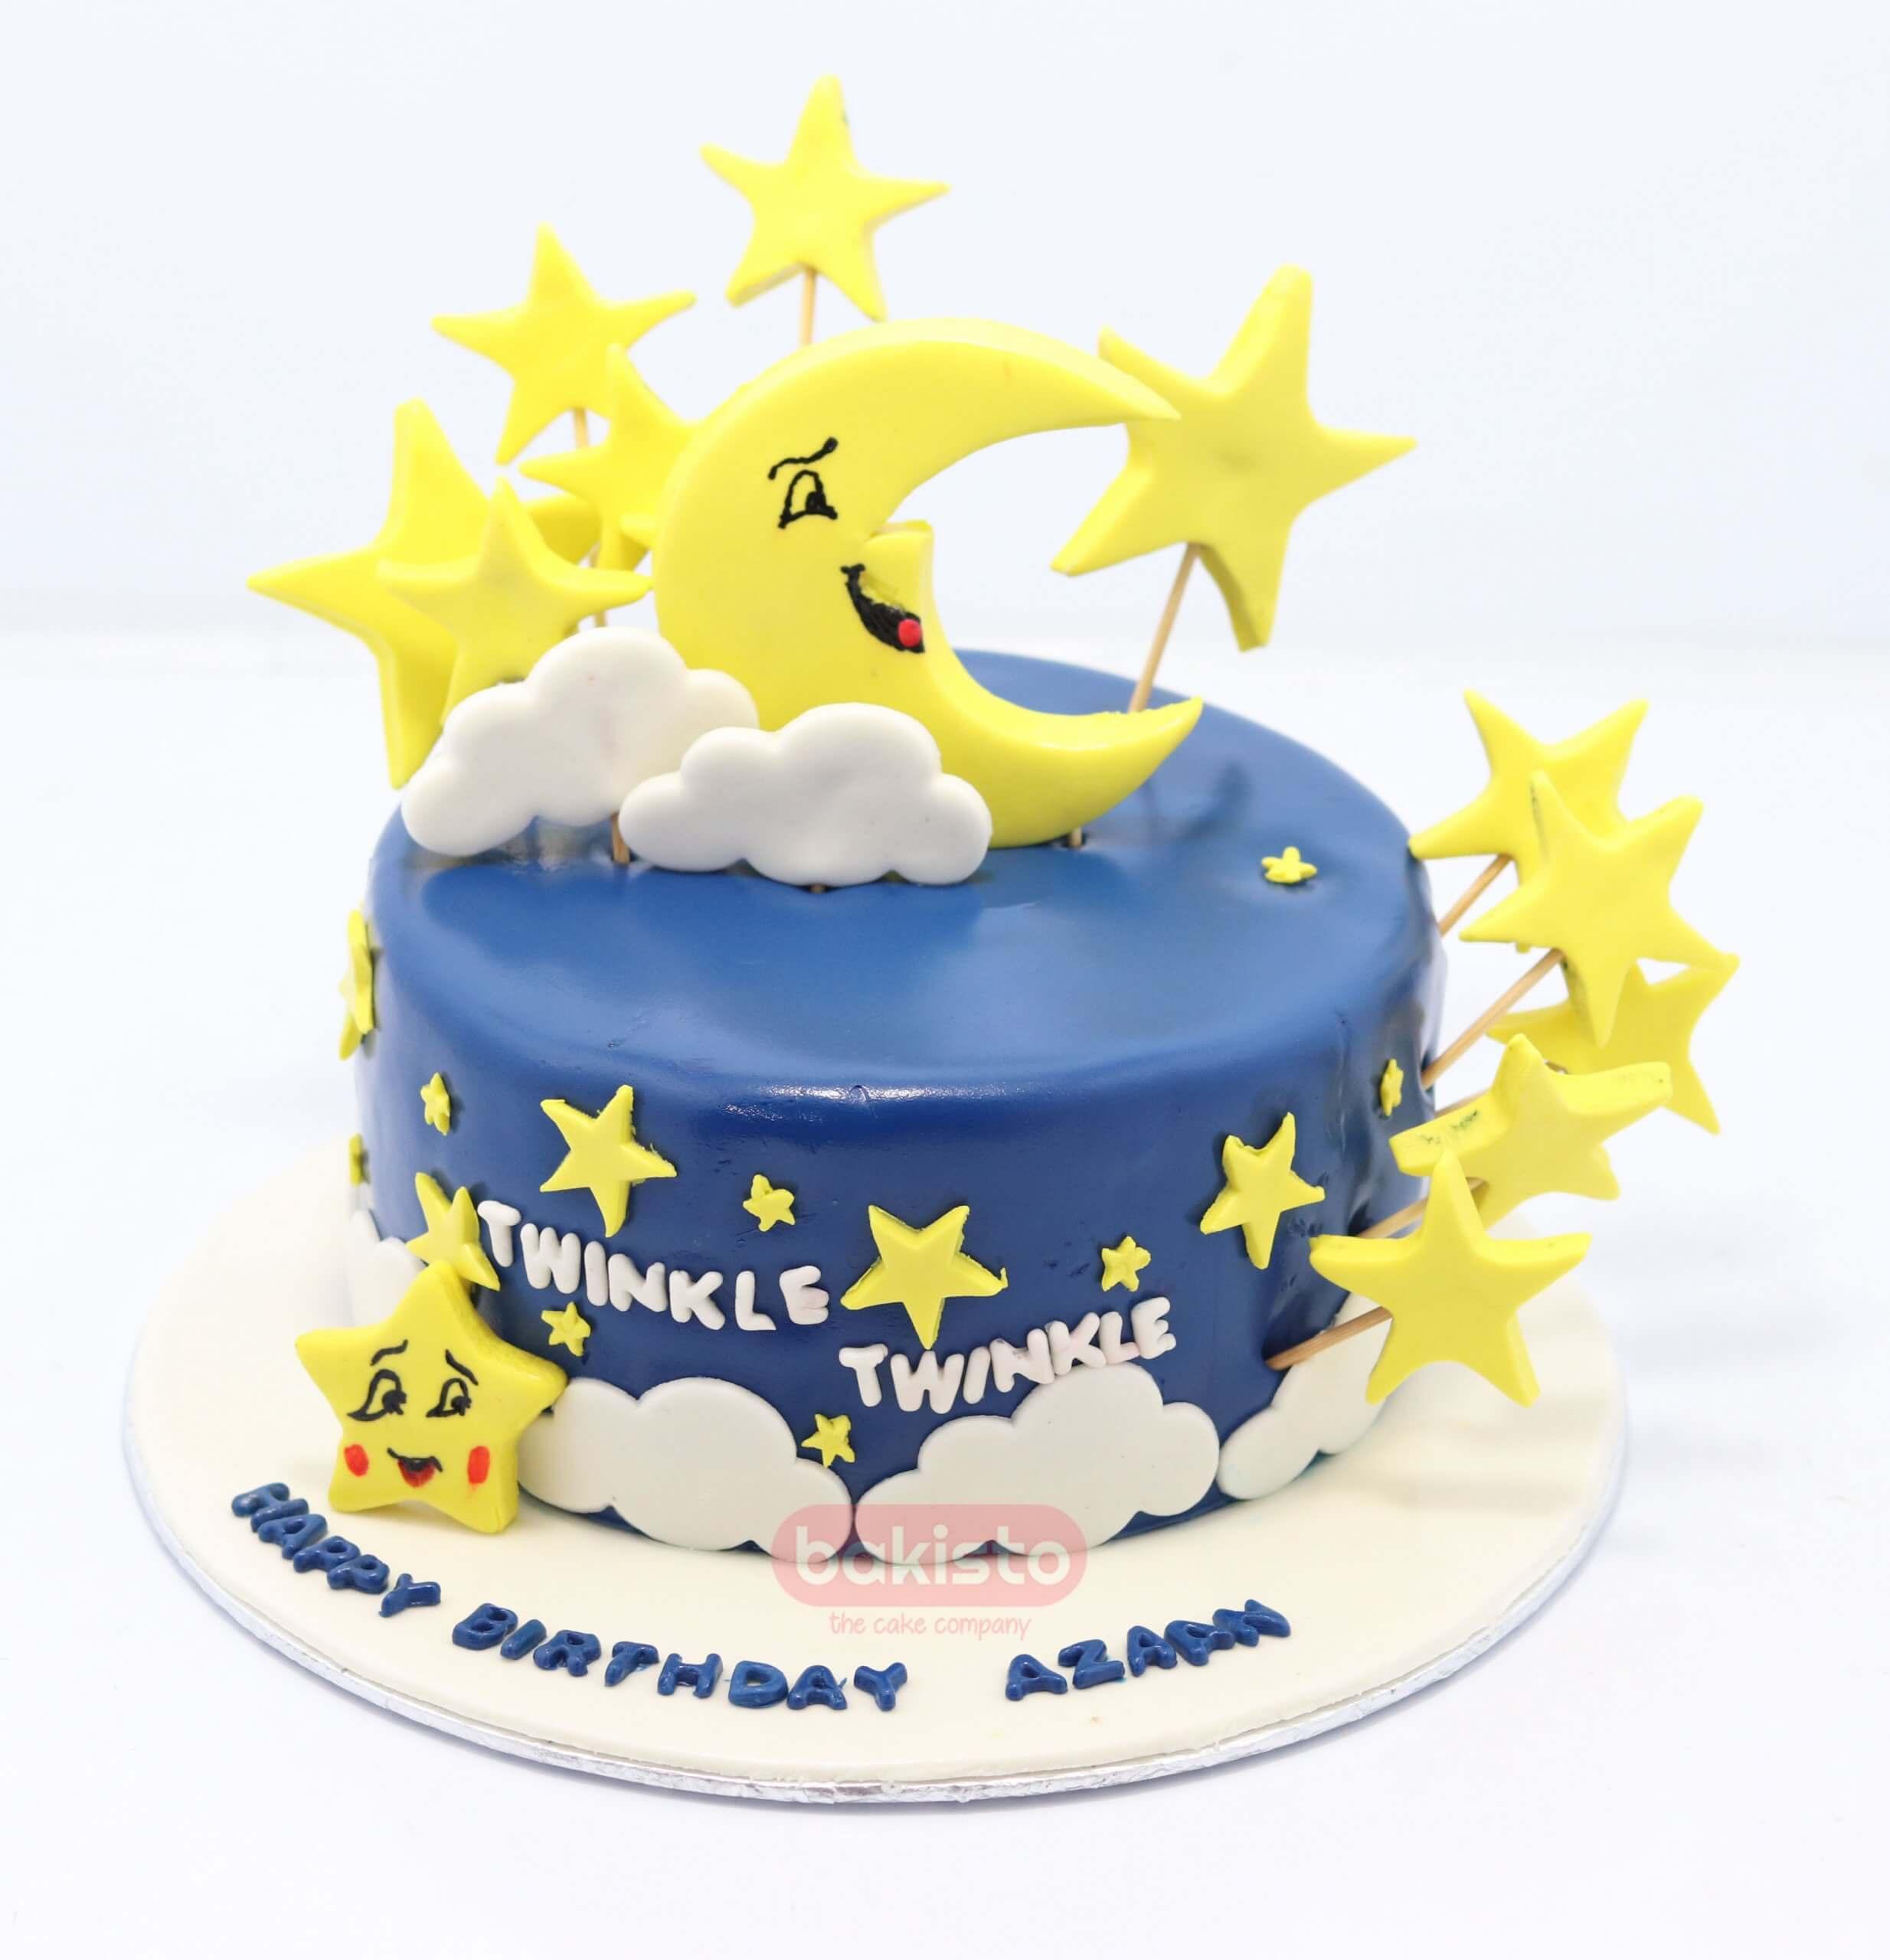 Pleasant Customized Twinkle Star Birthday Cake By Bakisto The Cake Company Personalised Birthday Cards Veneteletsinfo